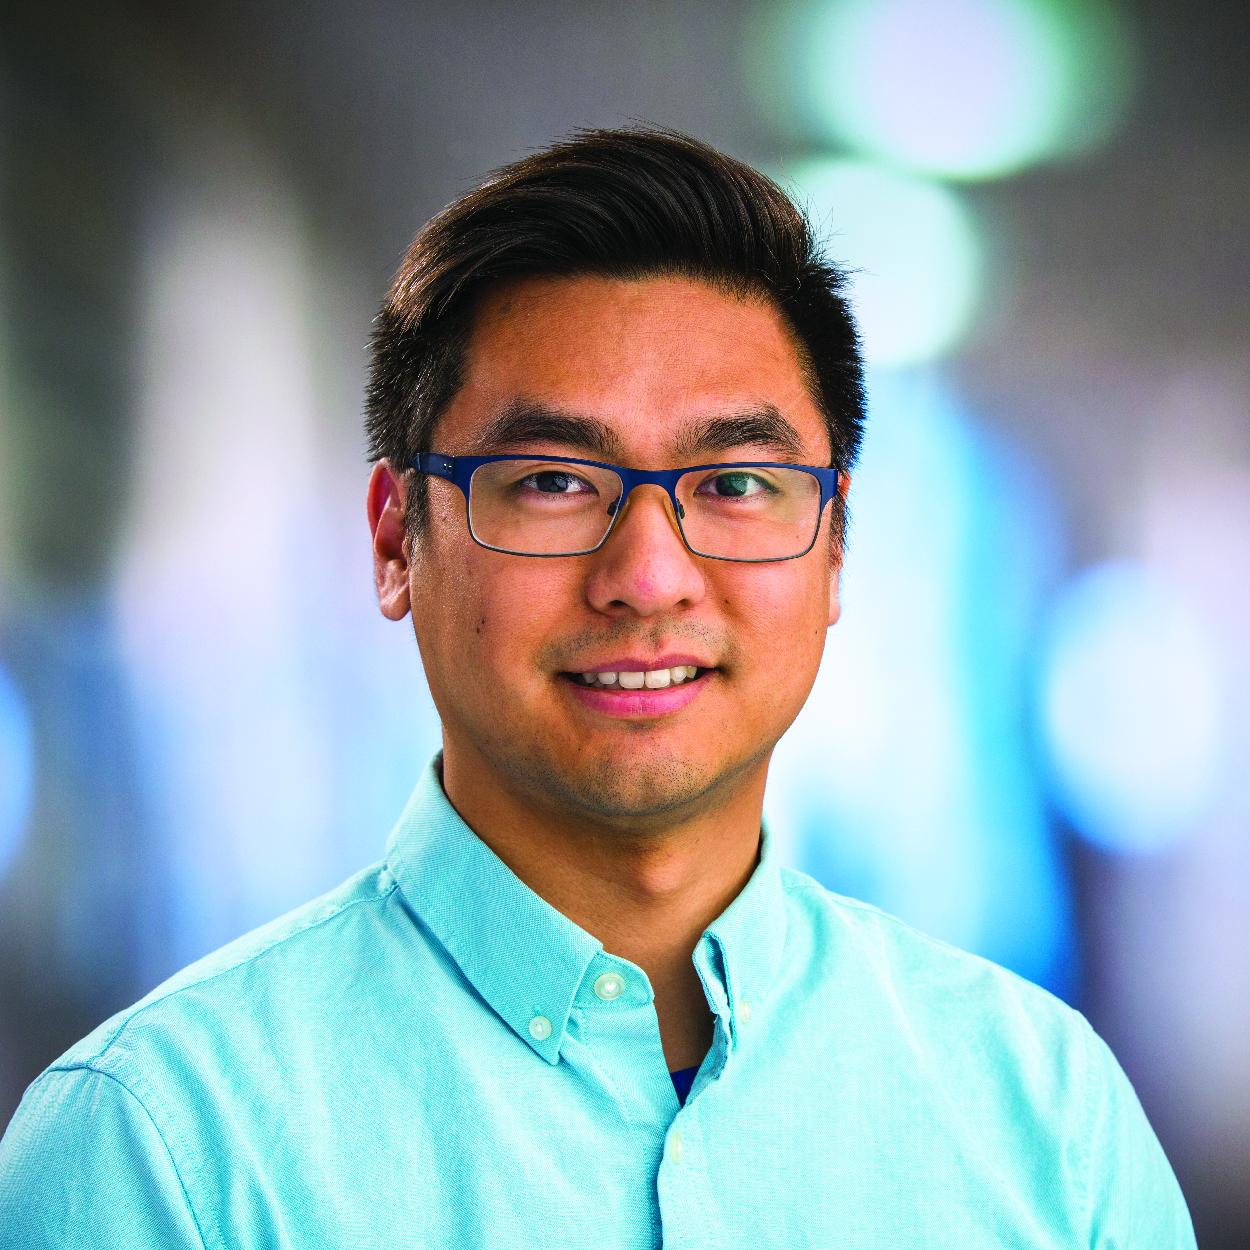 Faculty Profile – Molecular & Cellular Biology Graduate Program